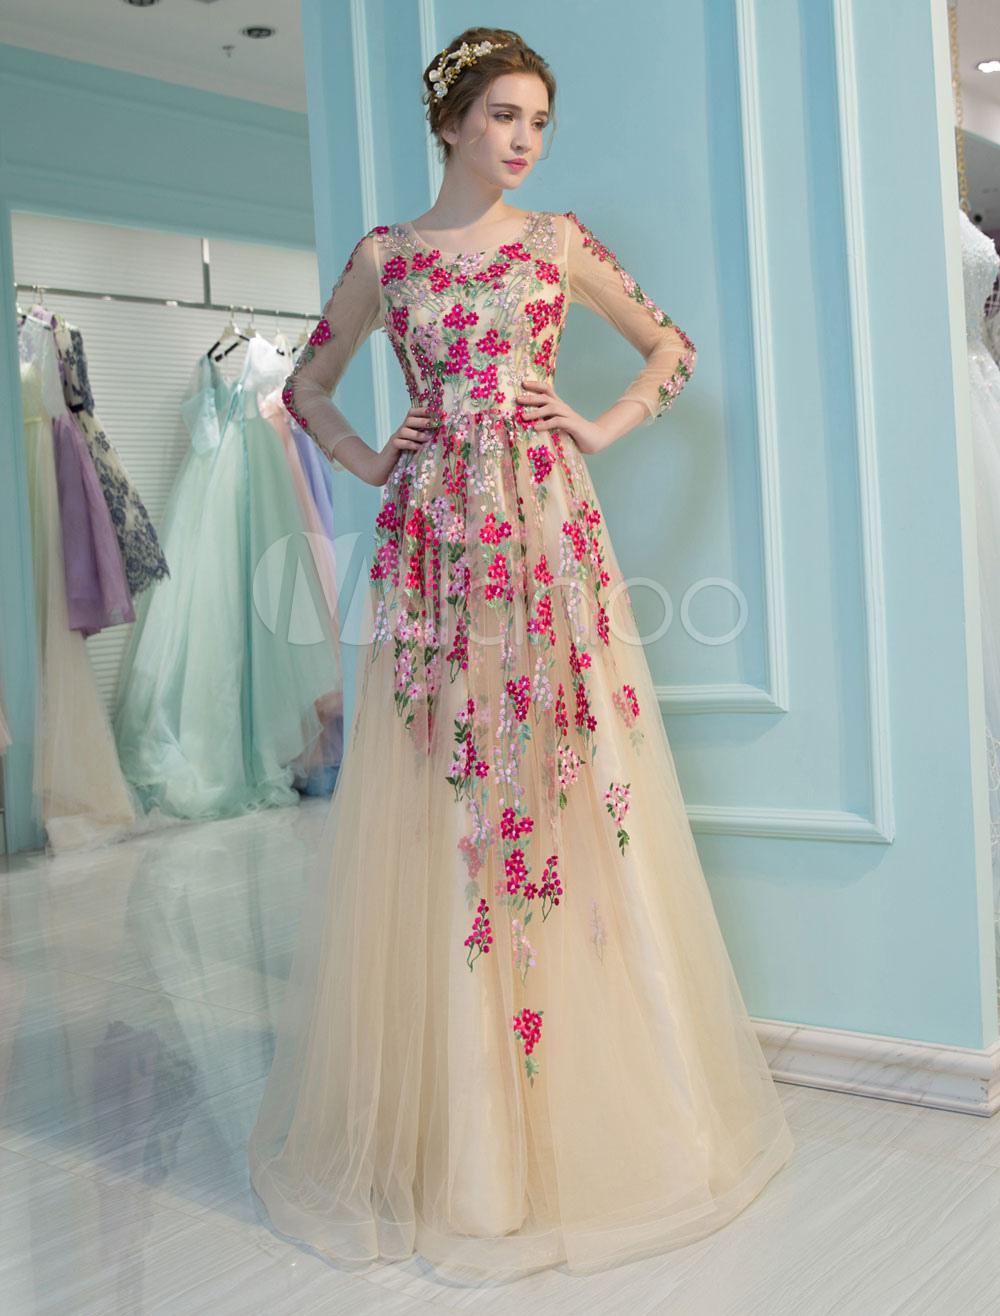 Champagner Abschlussball Kleider Luxuxlange Hulsen Heimkehr Kleid Blumen Gestickte Rhinestones Wulstige Fussboden Langen Gelegenheits Kleid Milanoo Com